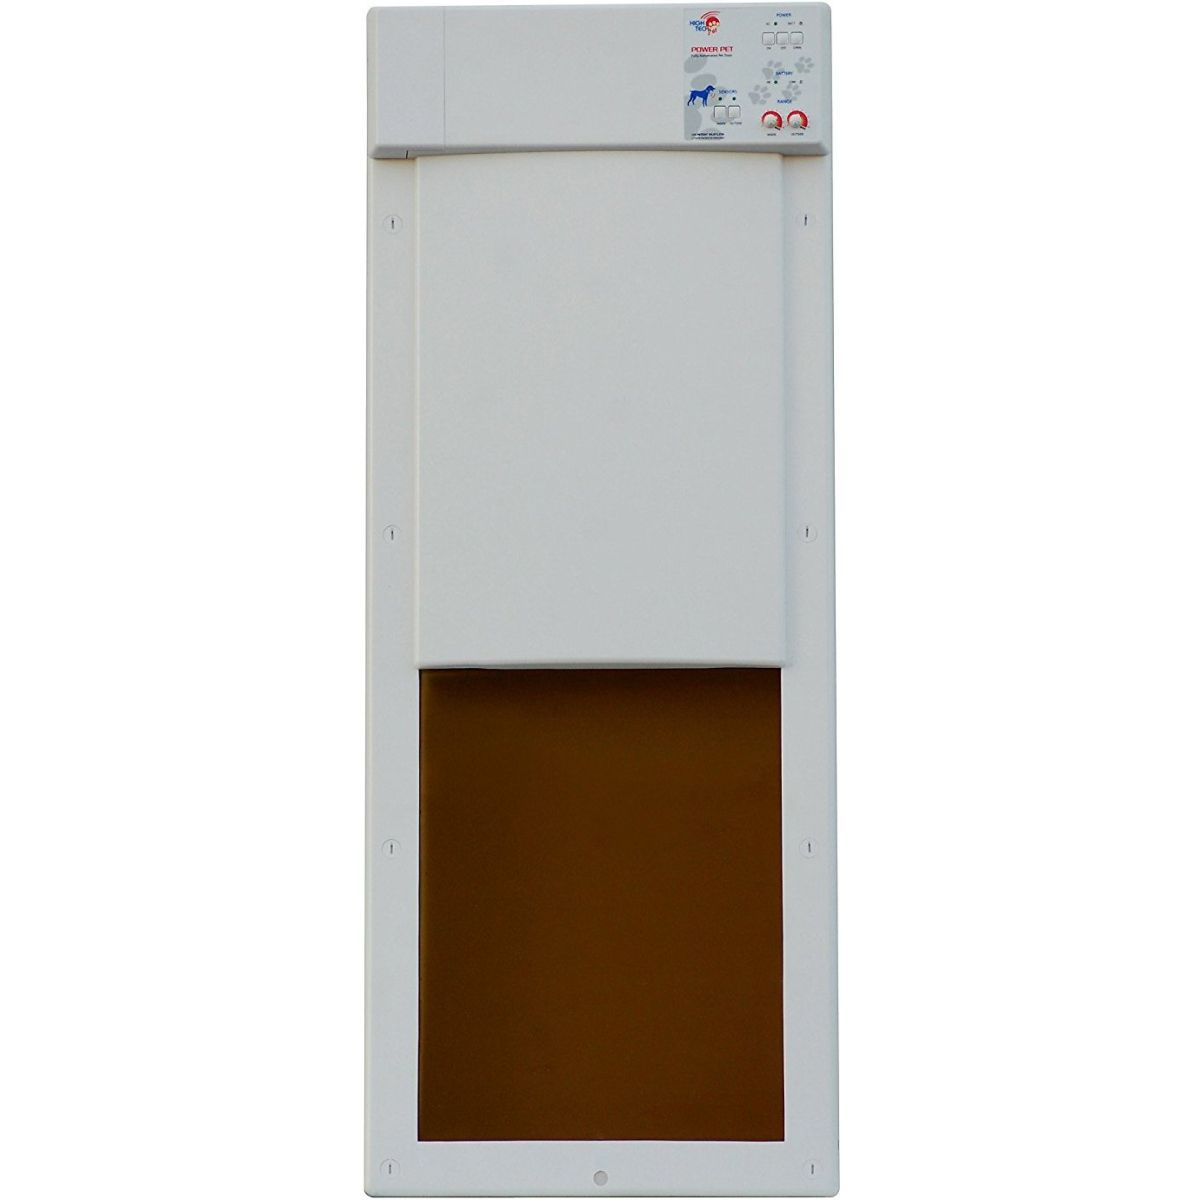 PX-2 Power Pet Fully Automatic Pet Door